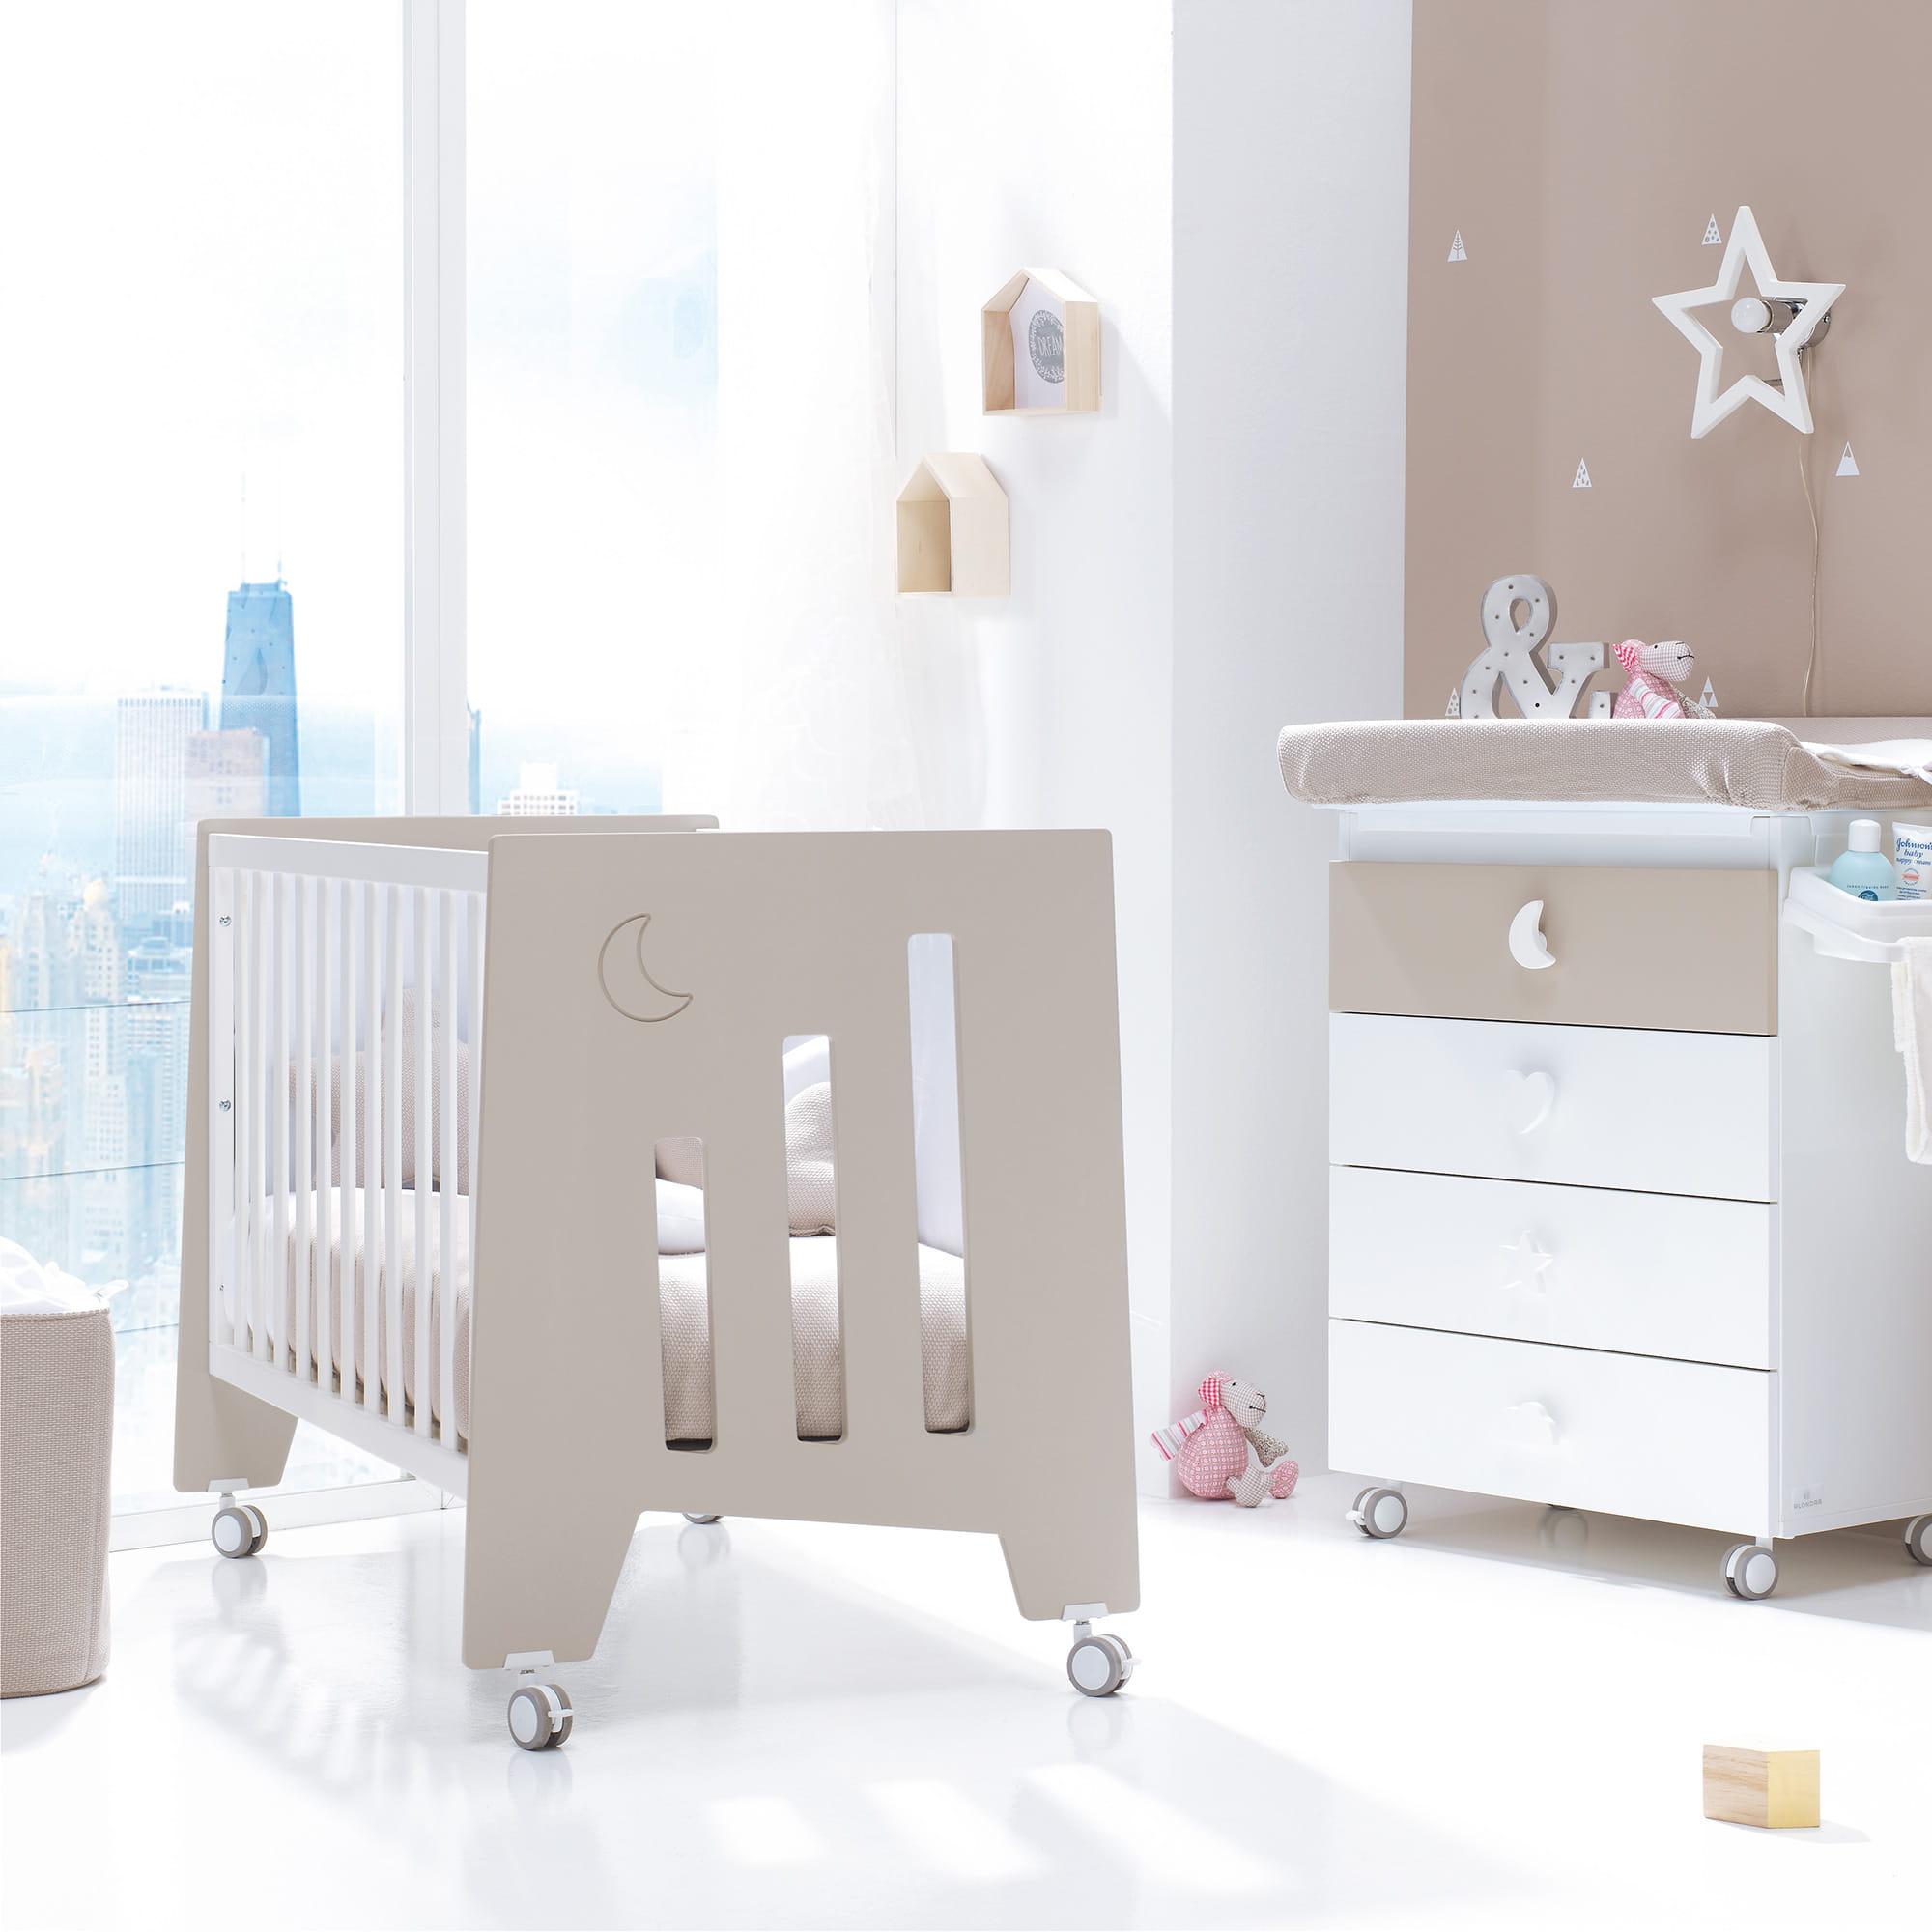 Cunas baratas de bebé tamaño 60x120cm modernas